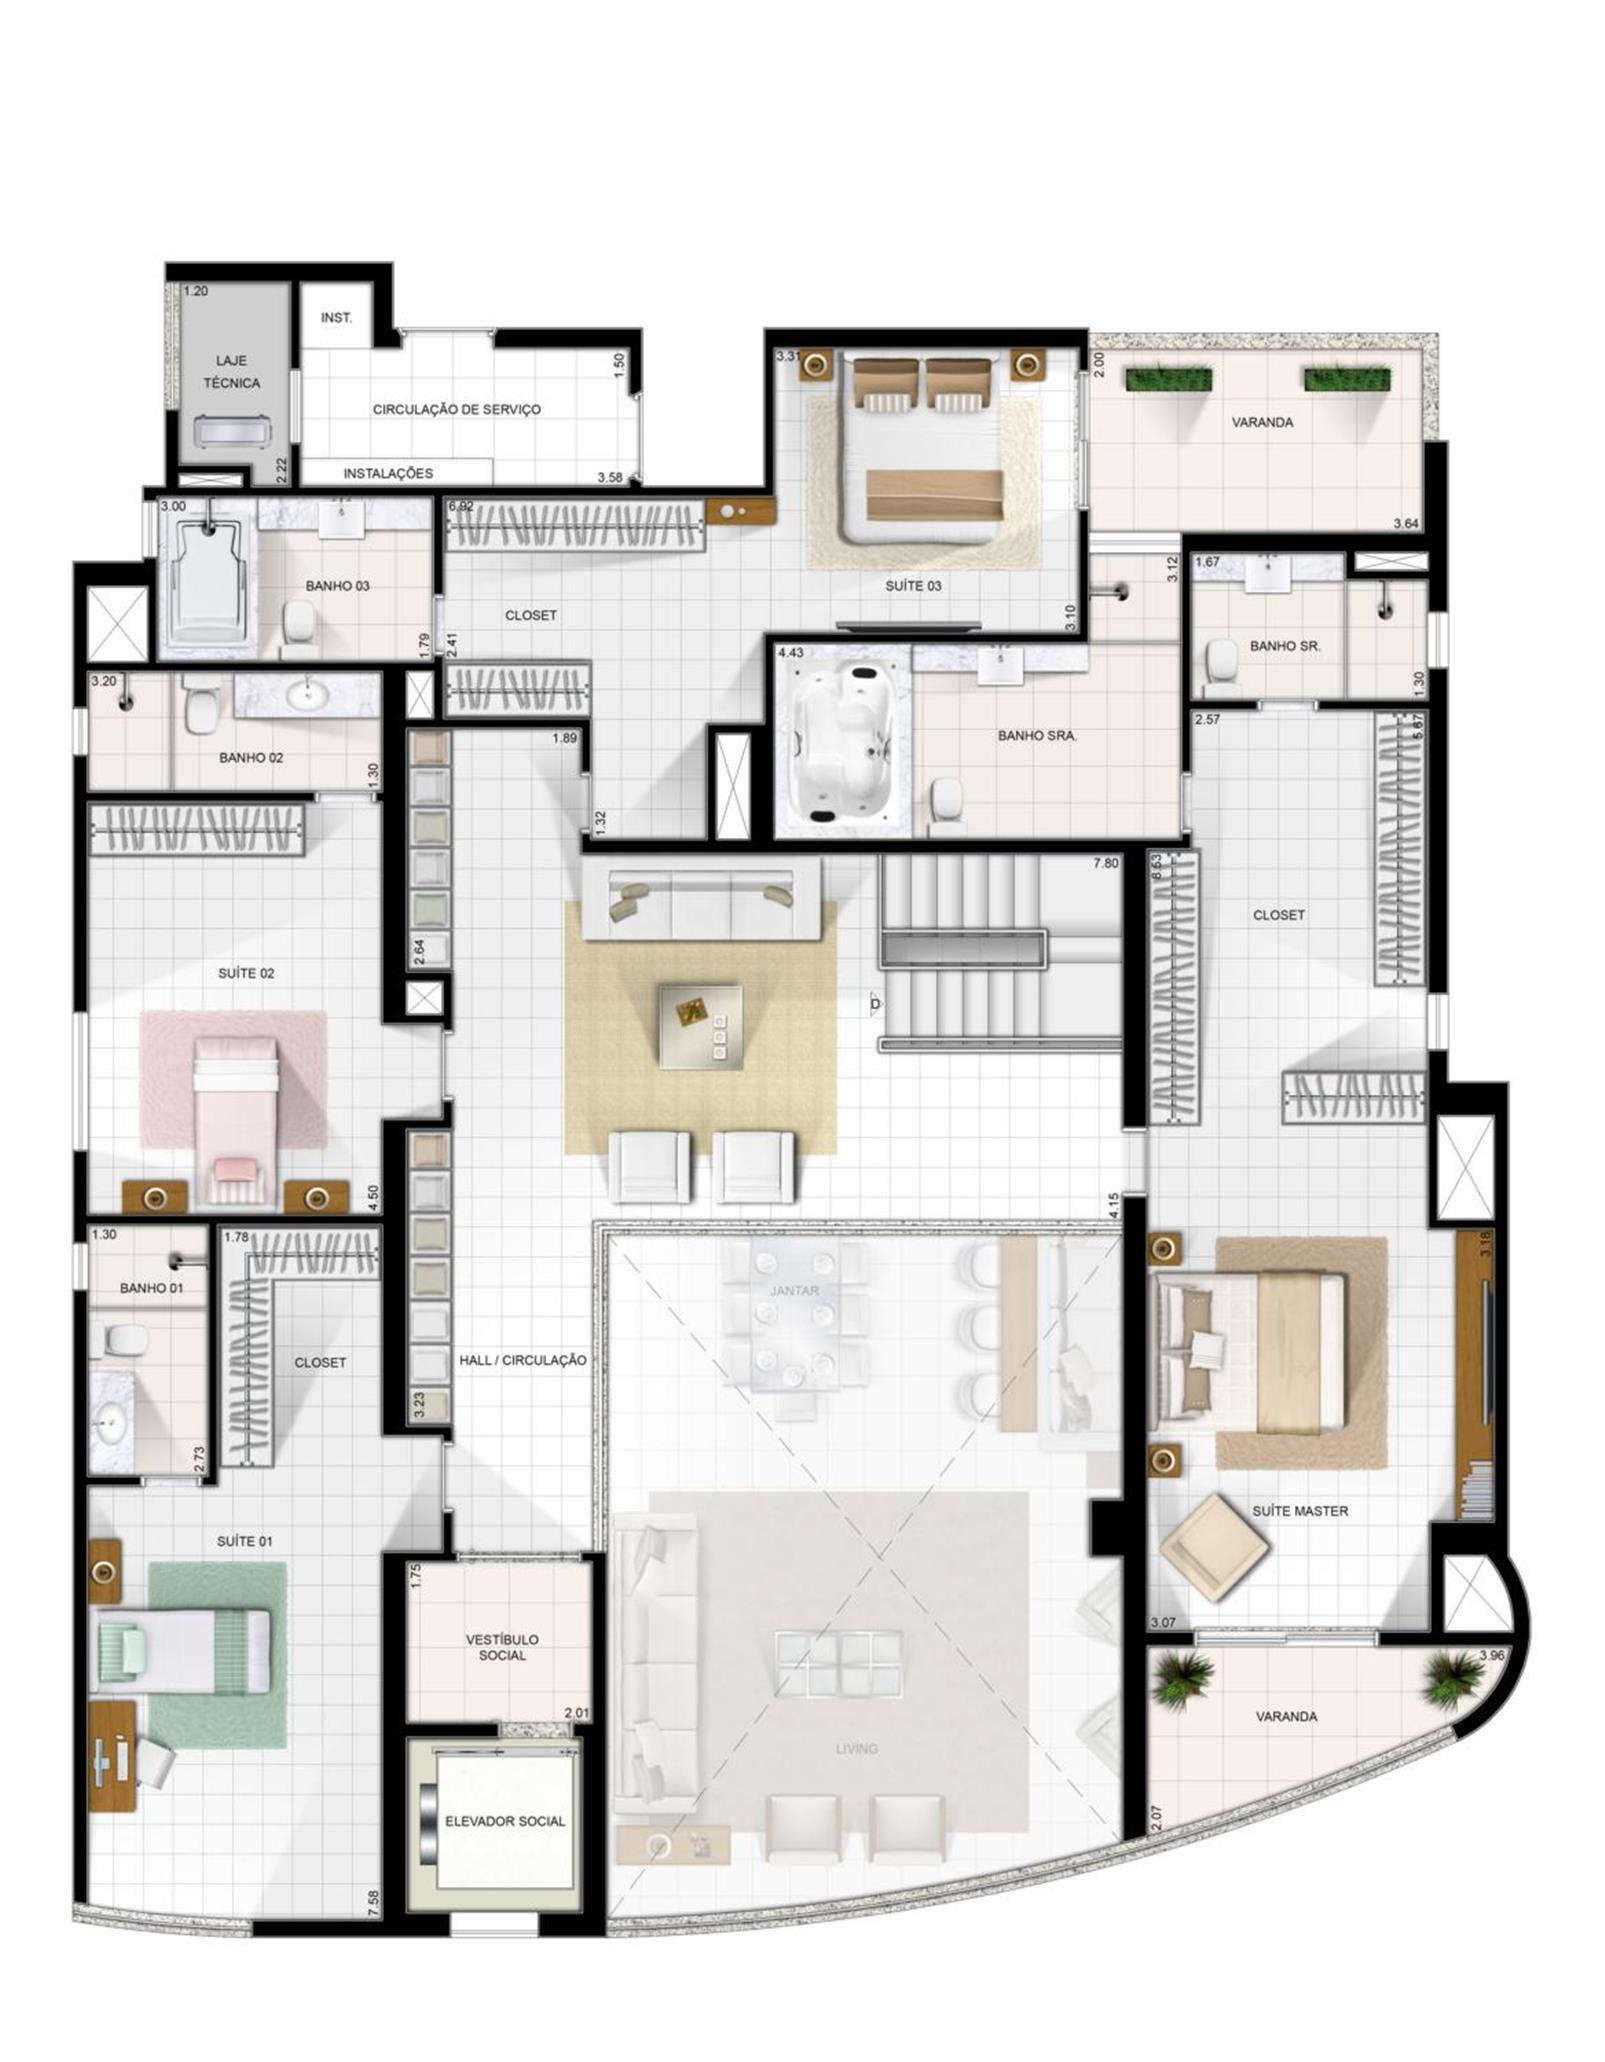 Duplex Superior | Diamond LifeStyle – Apartamentono  Jardim Goiás - Goiânia - Goiás